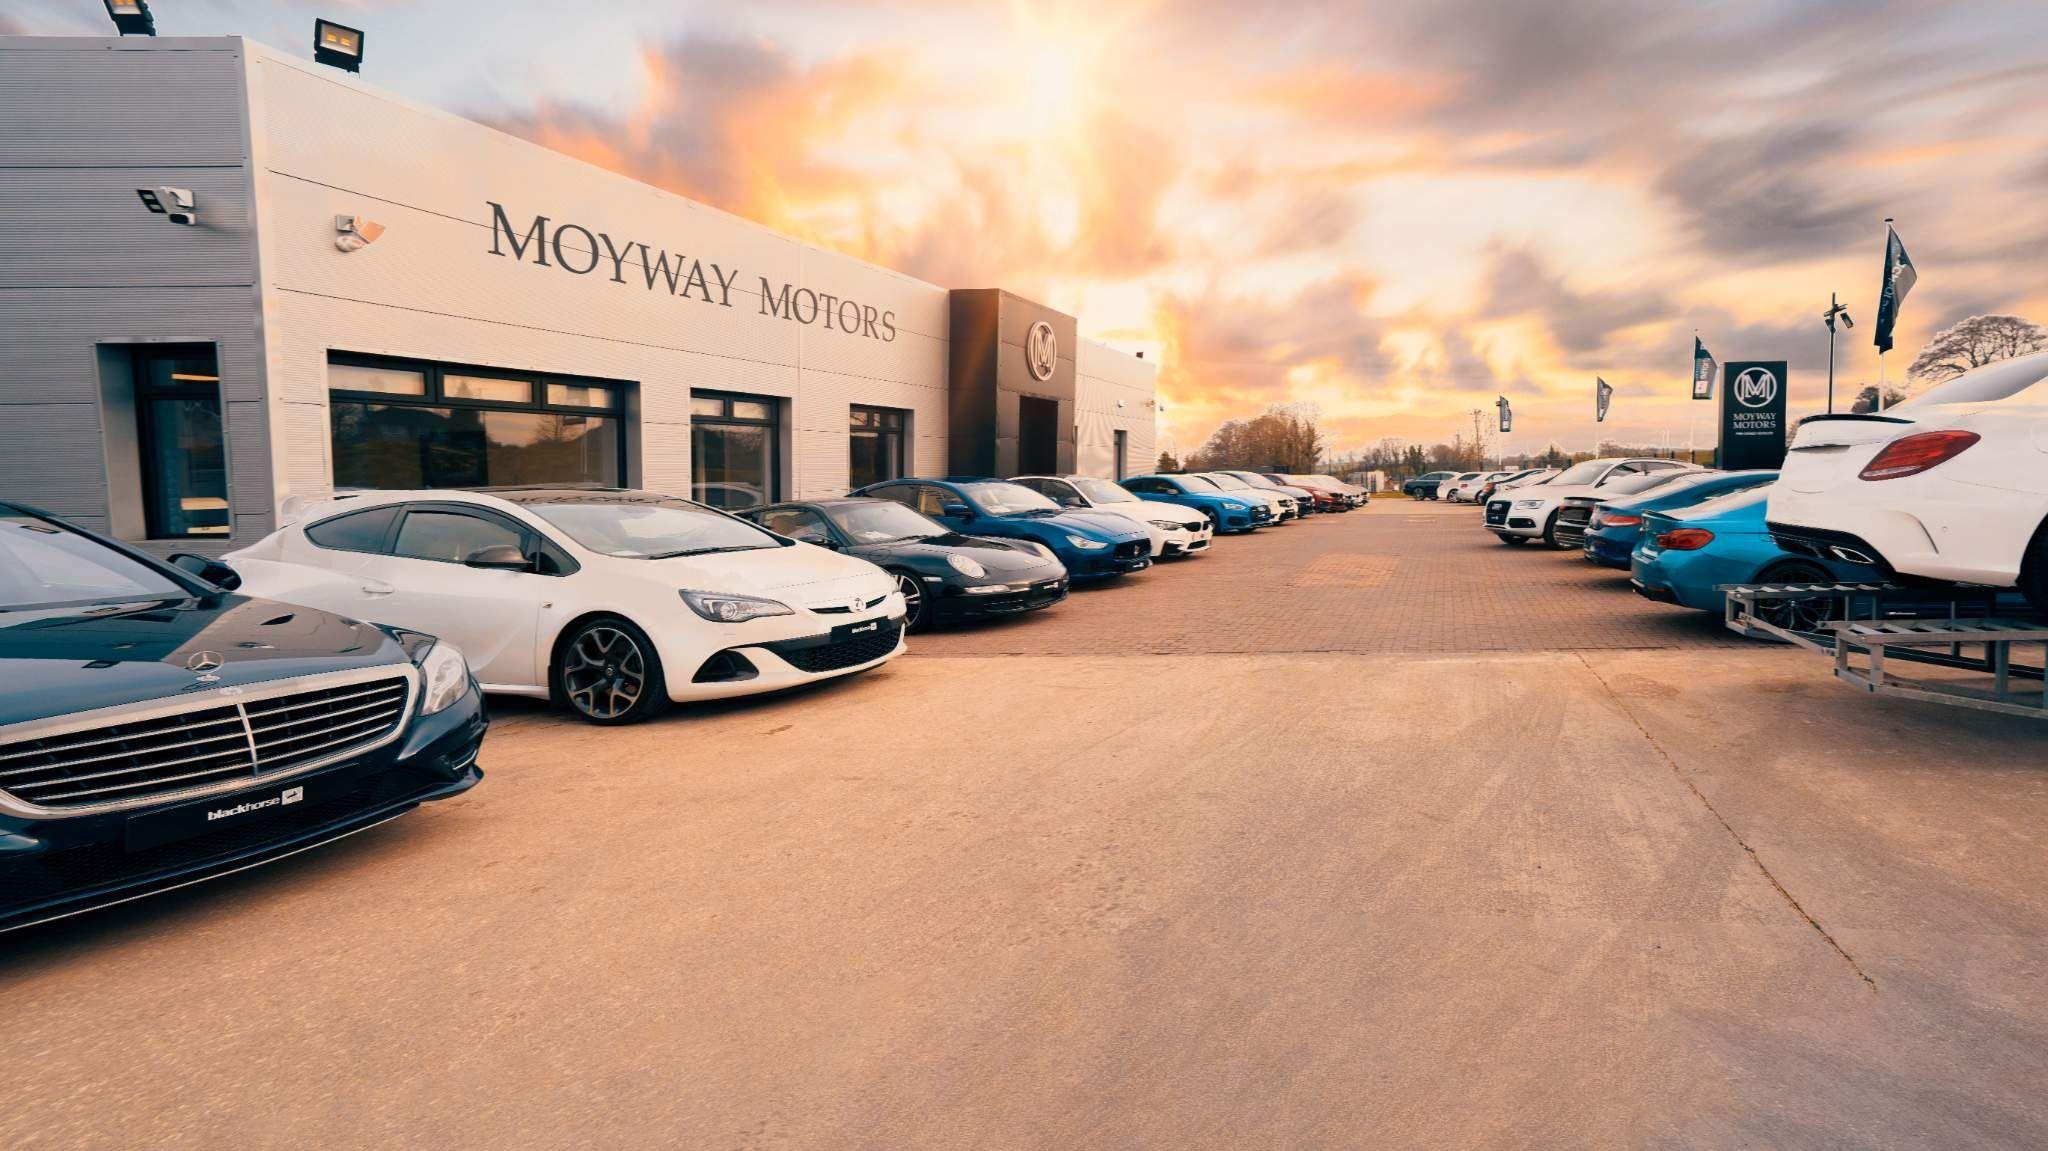 2018 Mercedes-Benz CLA CLASS 2.1 CLA200d AMG Line (s/s) 4dr Diesel Manual – Moyway Motors Dungannon full